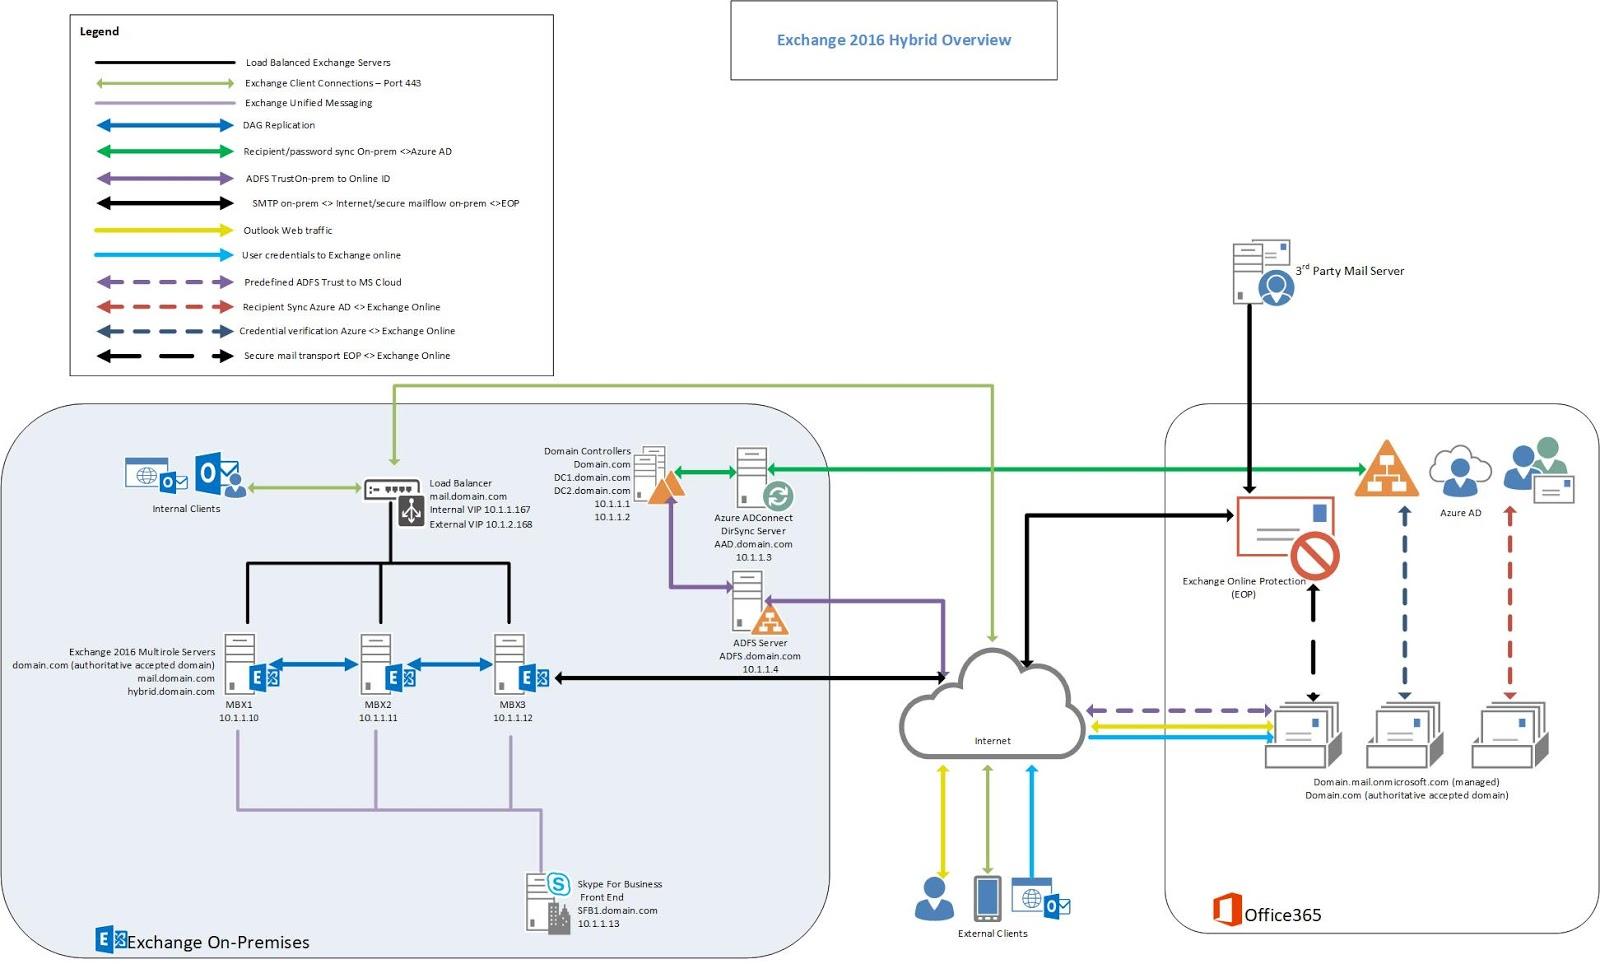 Exchange 2016 Planning Diagram Hybrid